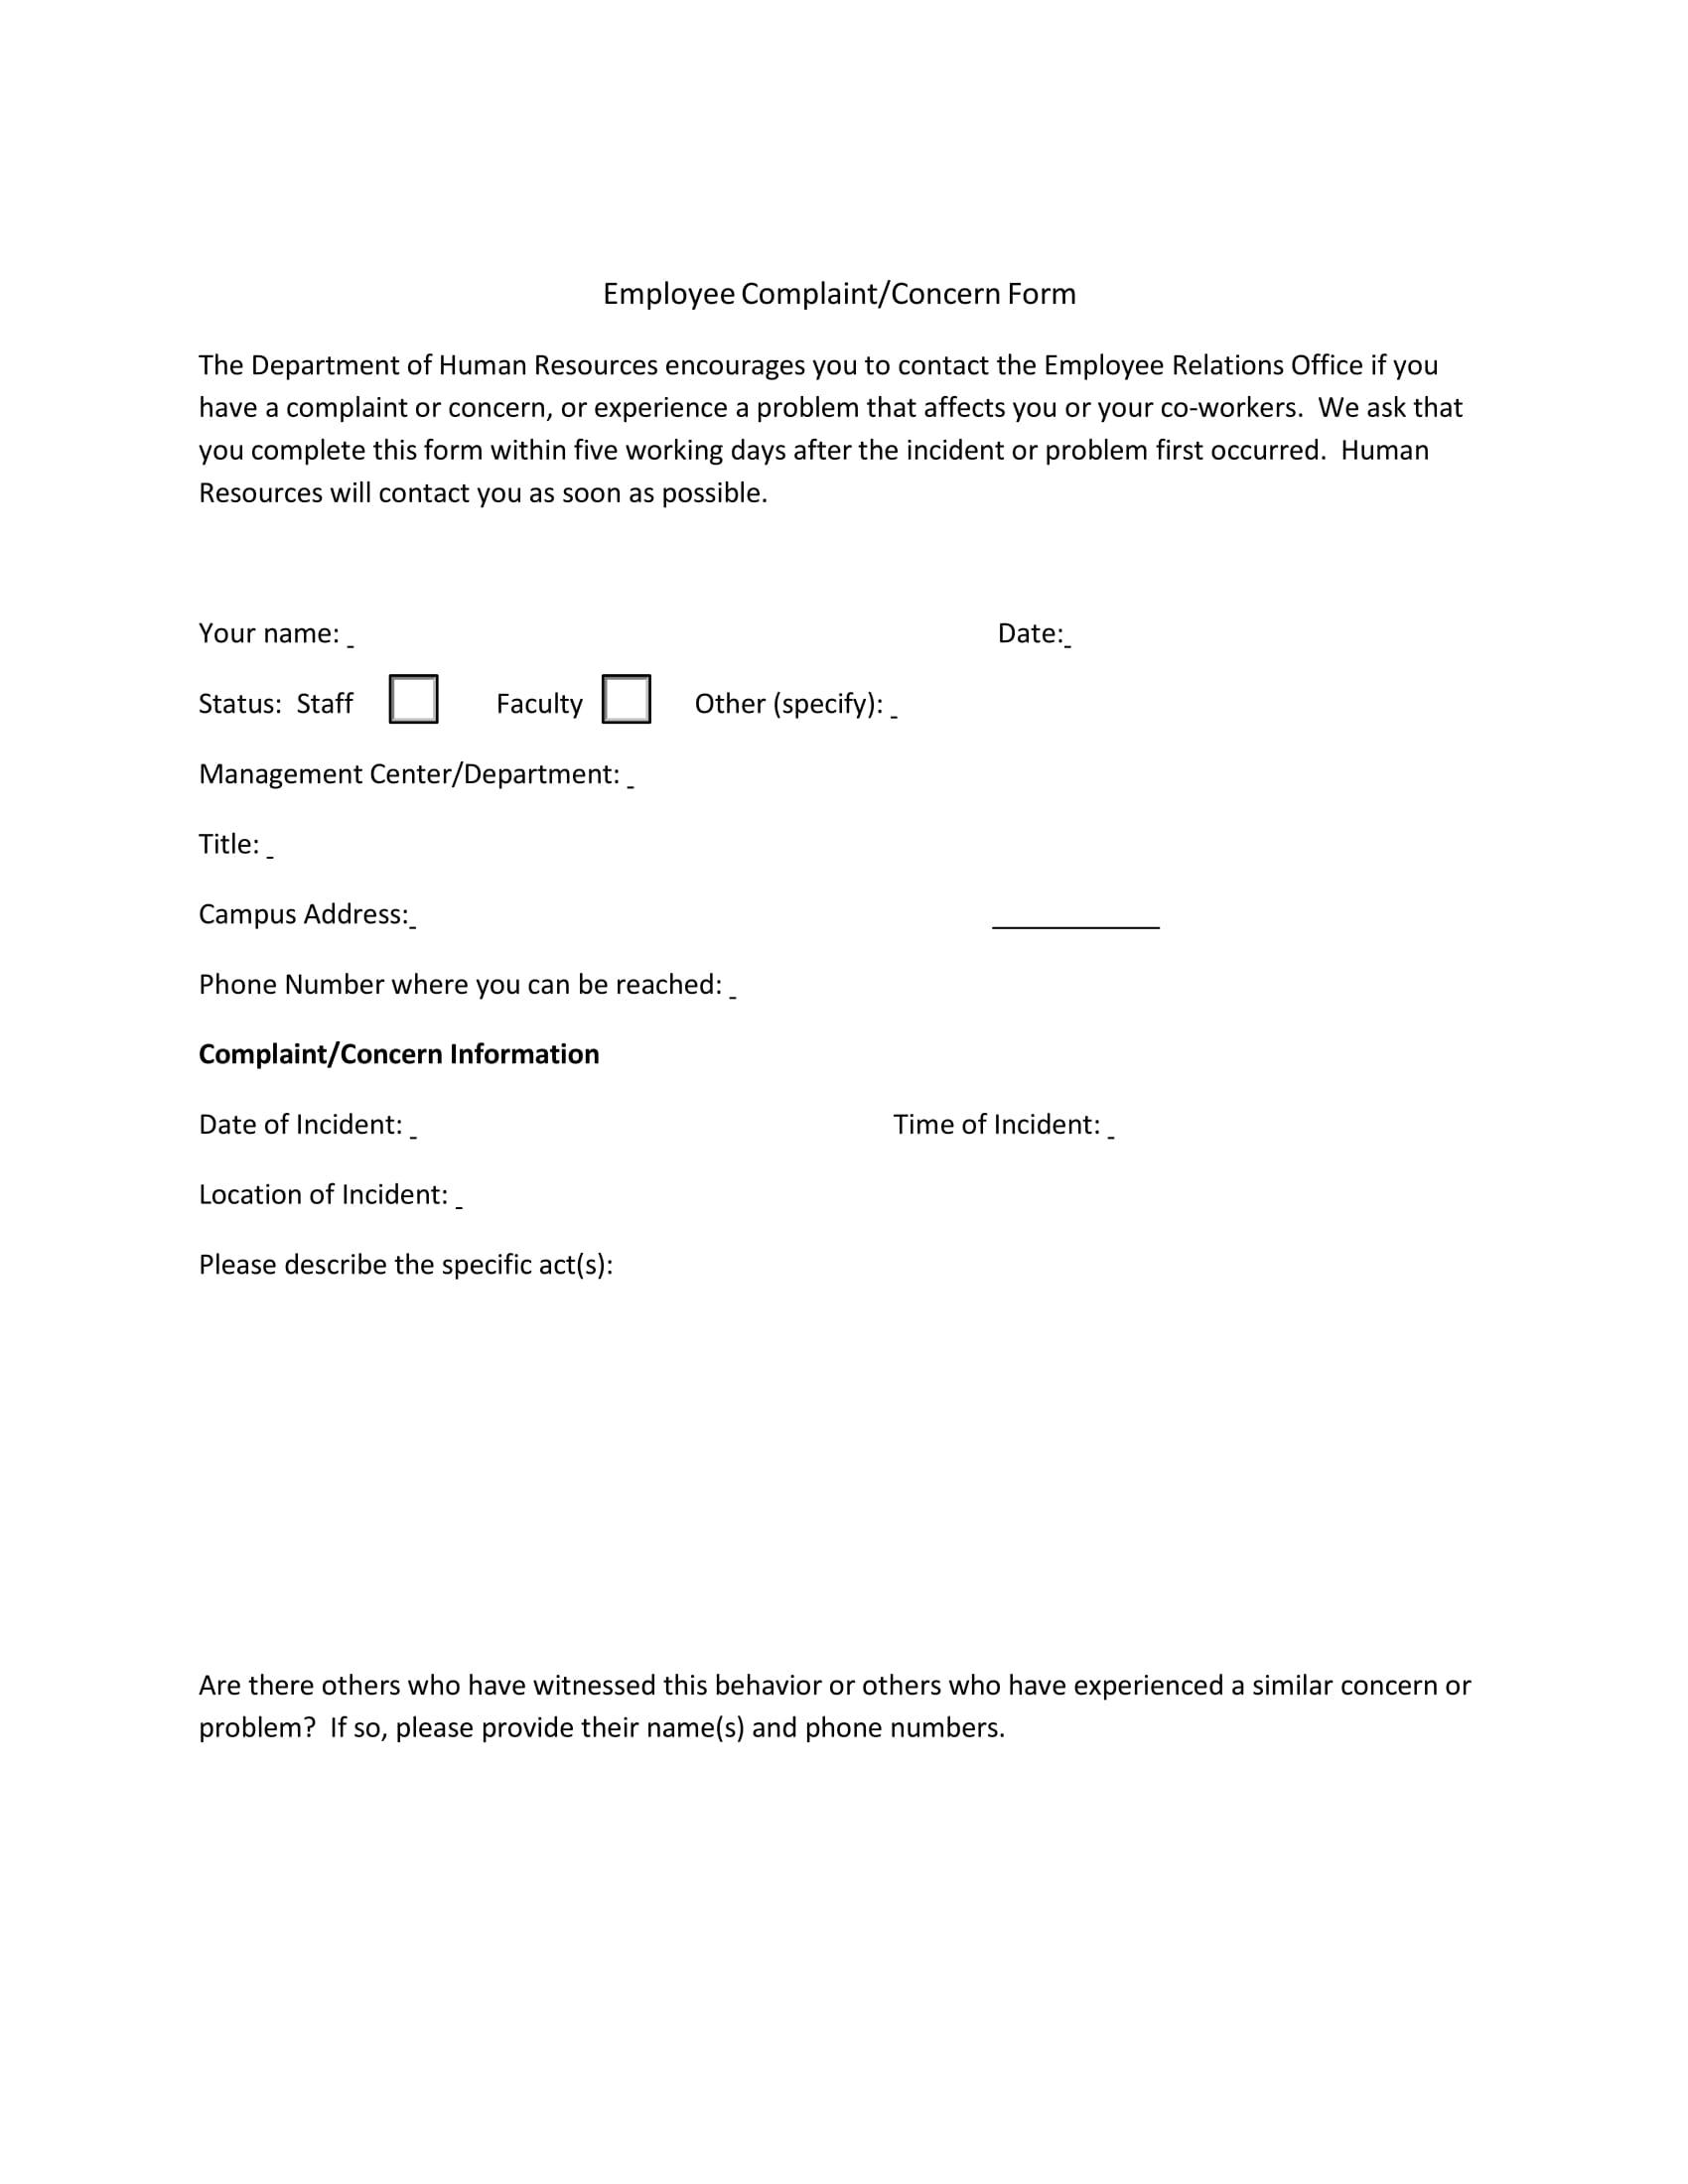 business employee complaint concern form 1